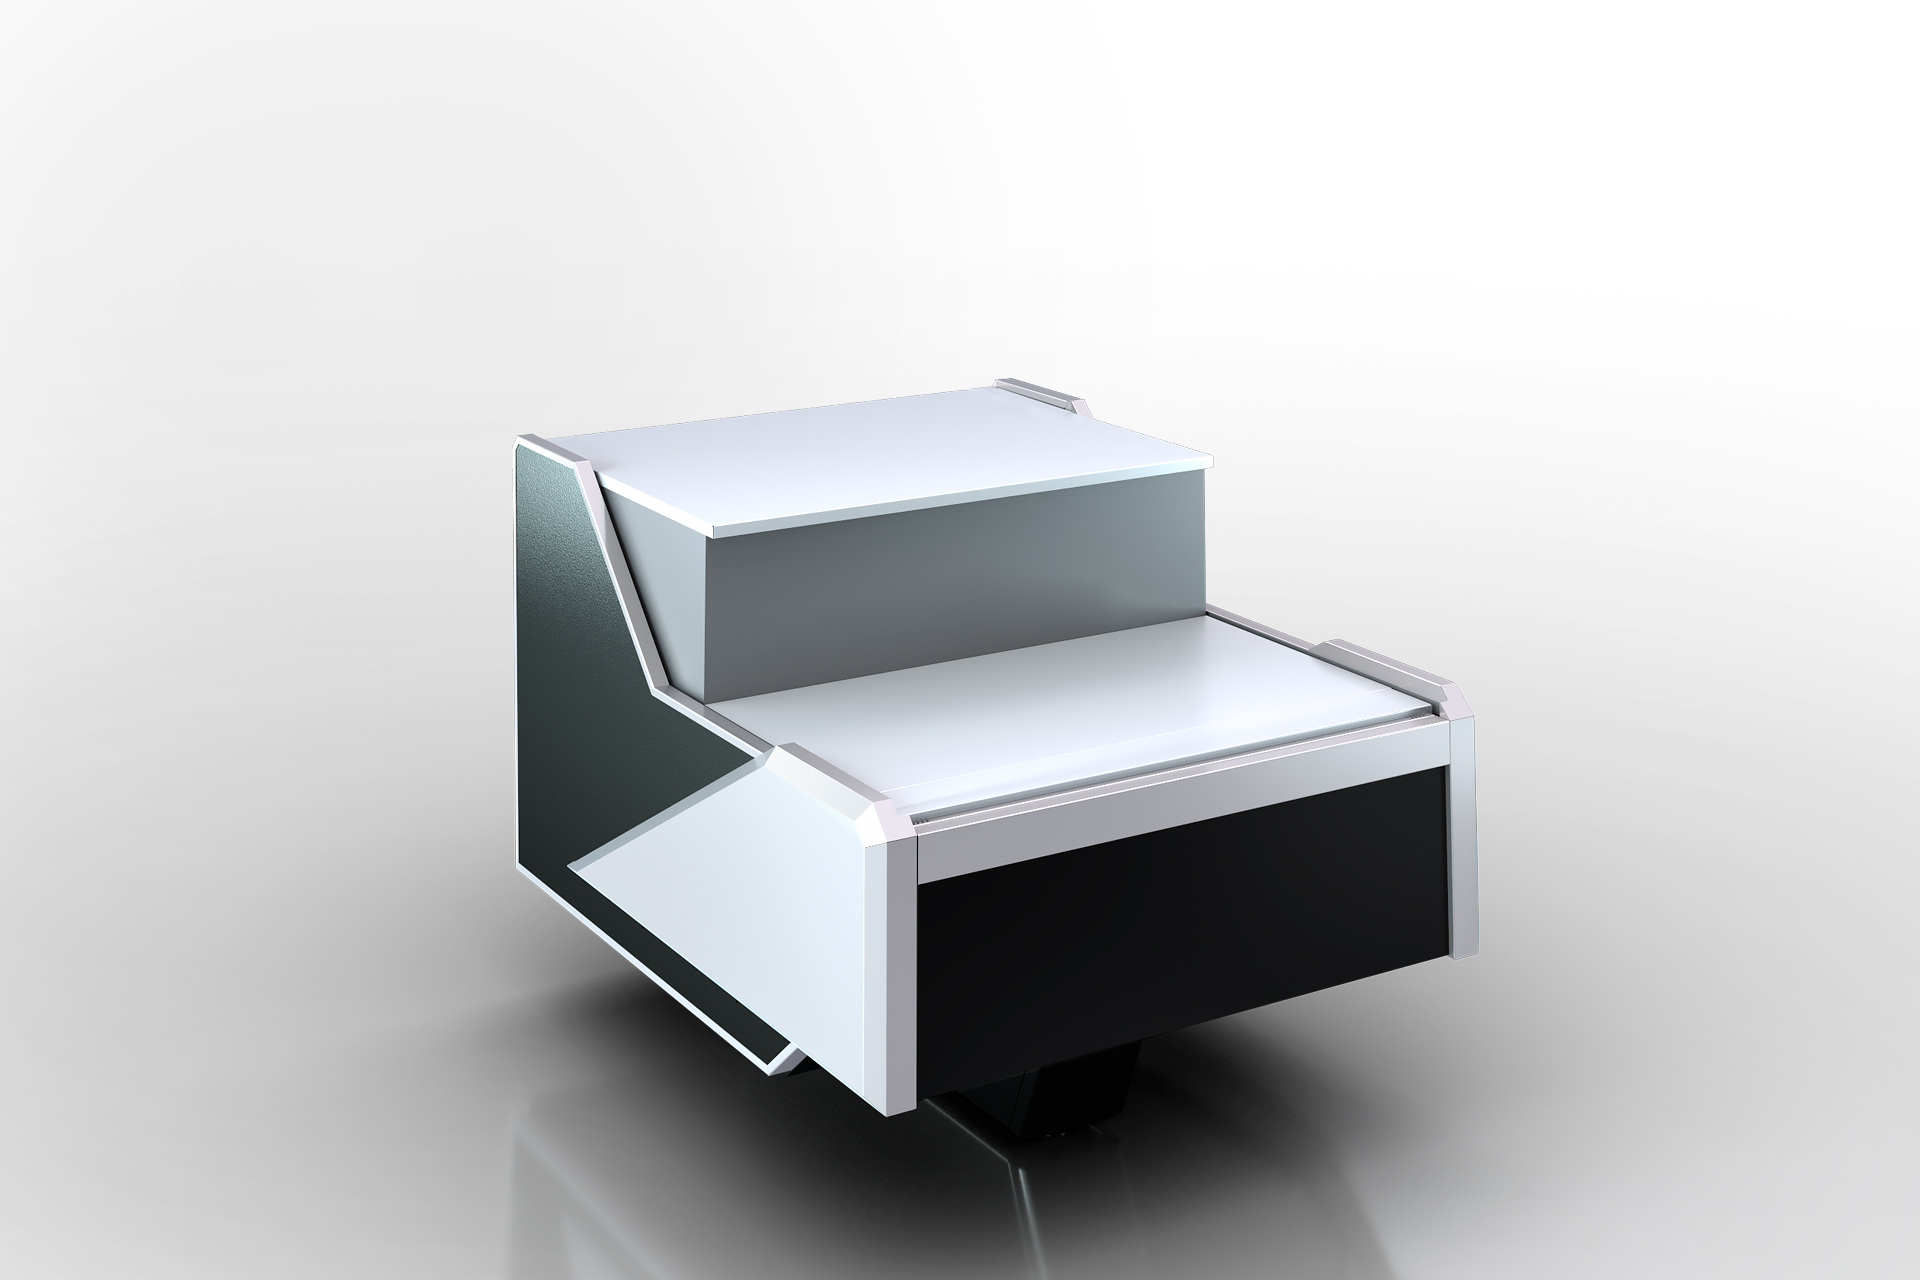 Витрина Missouri enigma NC 122 cash desk 084